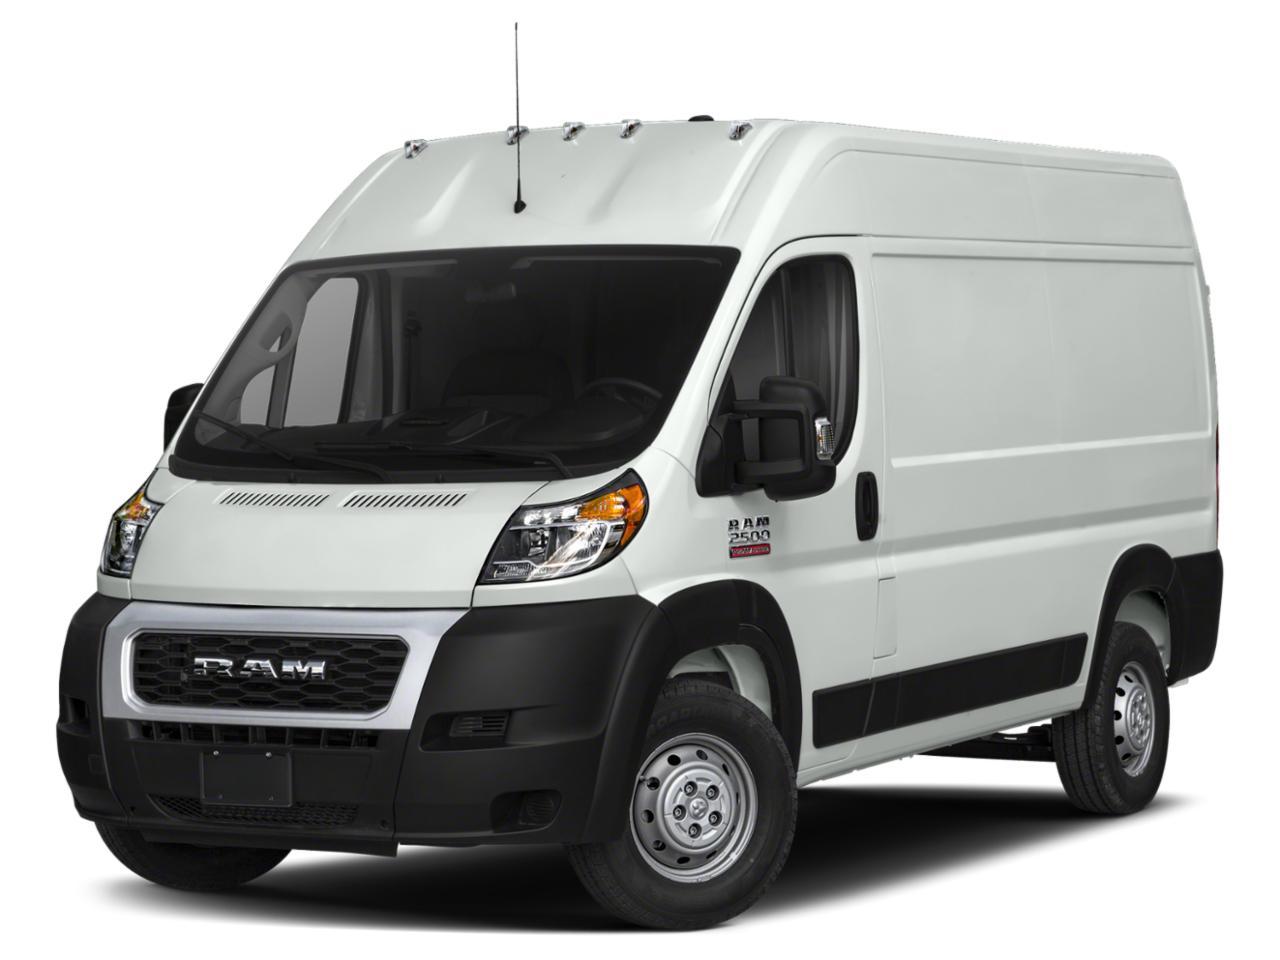 2019 Ram ProMaster Cargo Van Vehicle Photo in GARDNER, MA 01440-3110